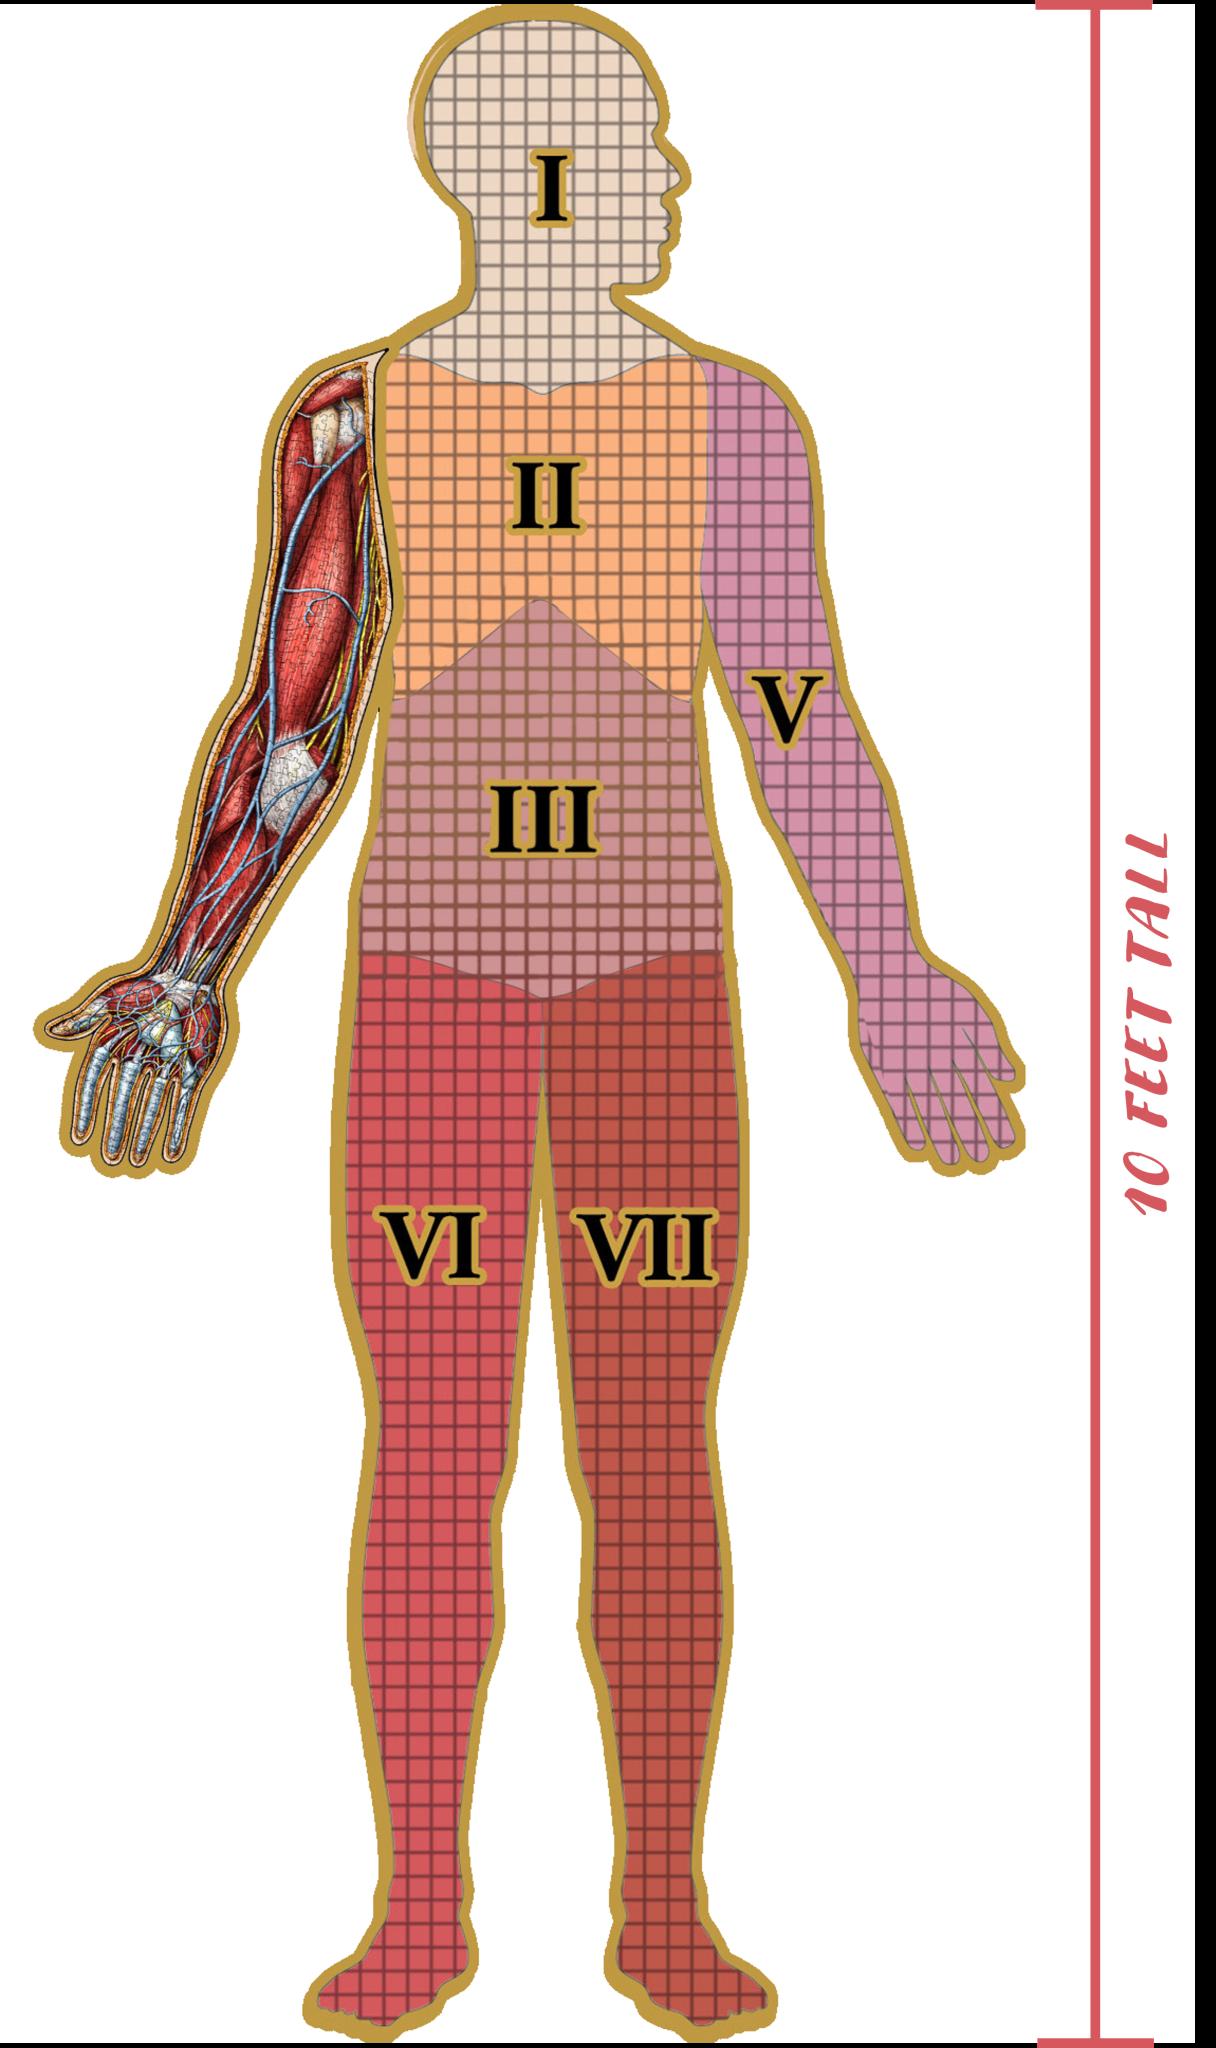 498 - Dr. Livingston's Anatomy Jigsaw Puzzles Volume IV - Human Right Arm